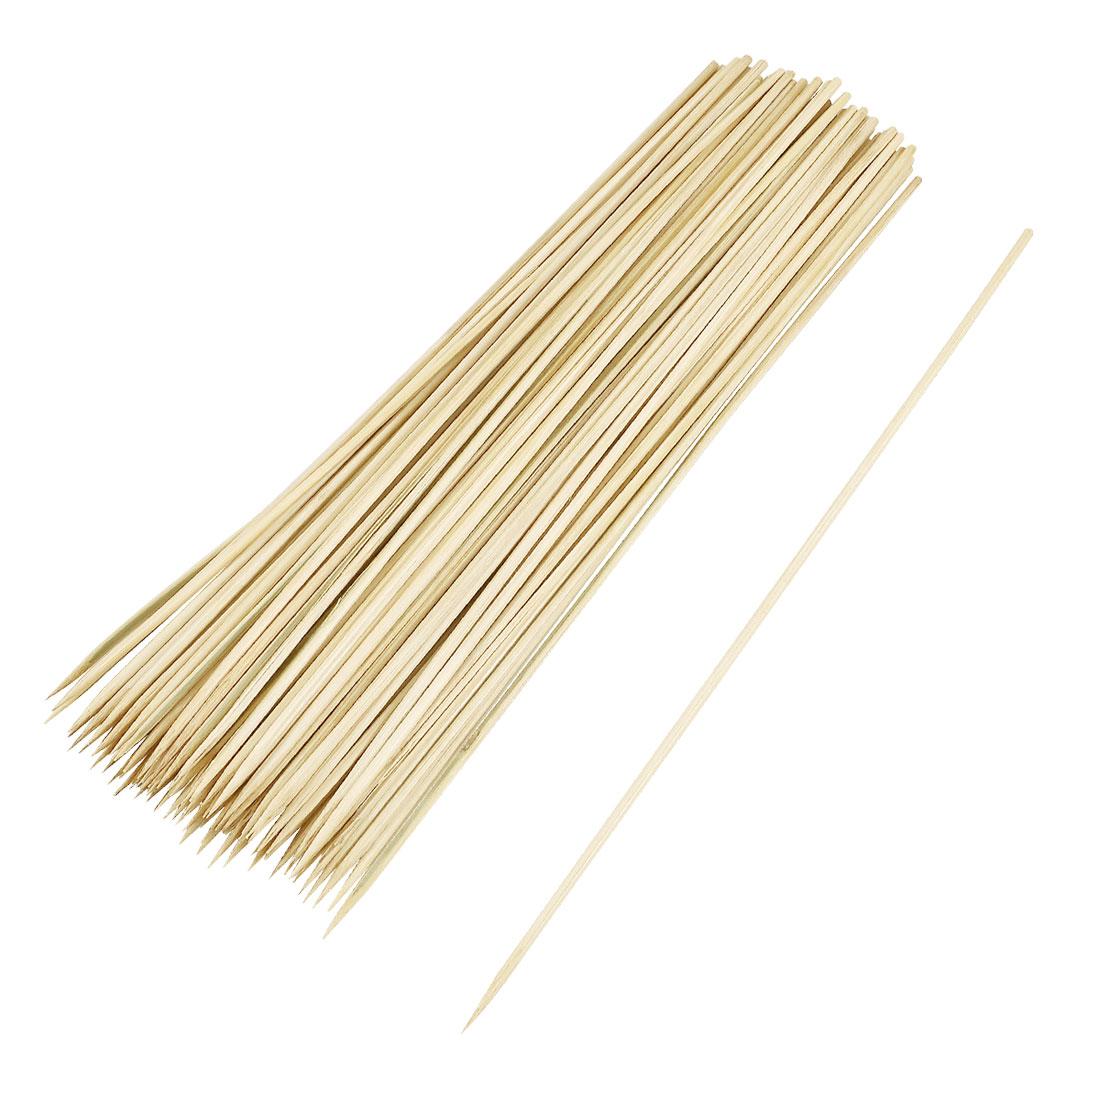 93 Pcs Bamboo BBQ Skewers Barbecue Shish Kabob Sticks